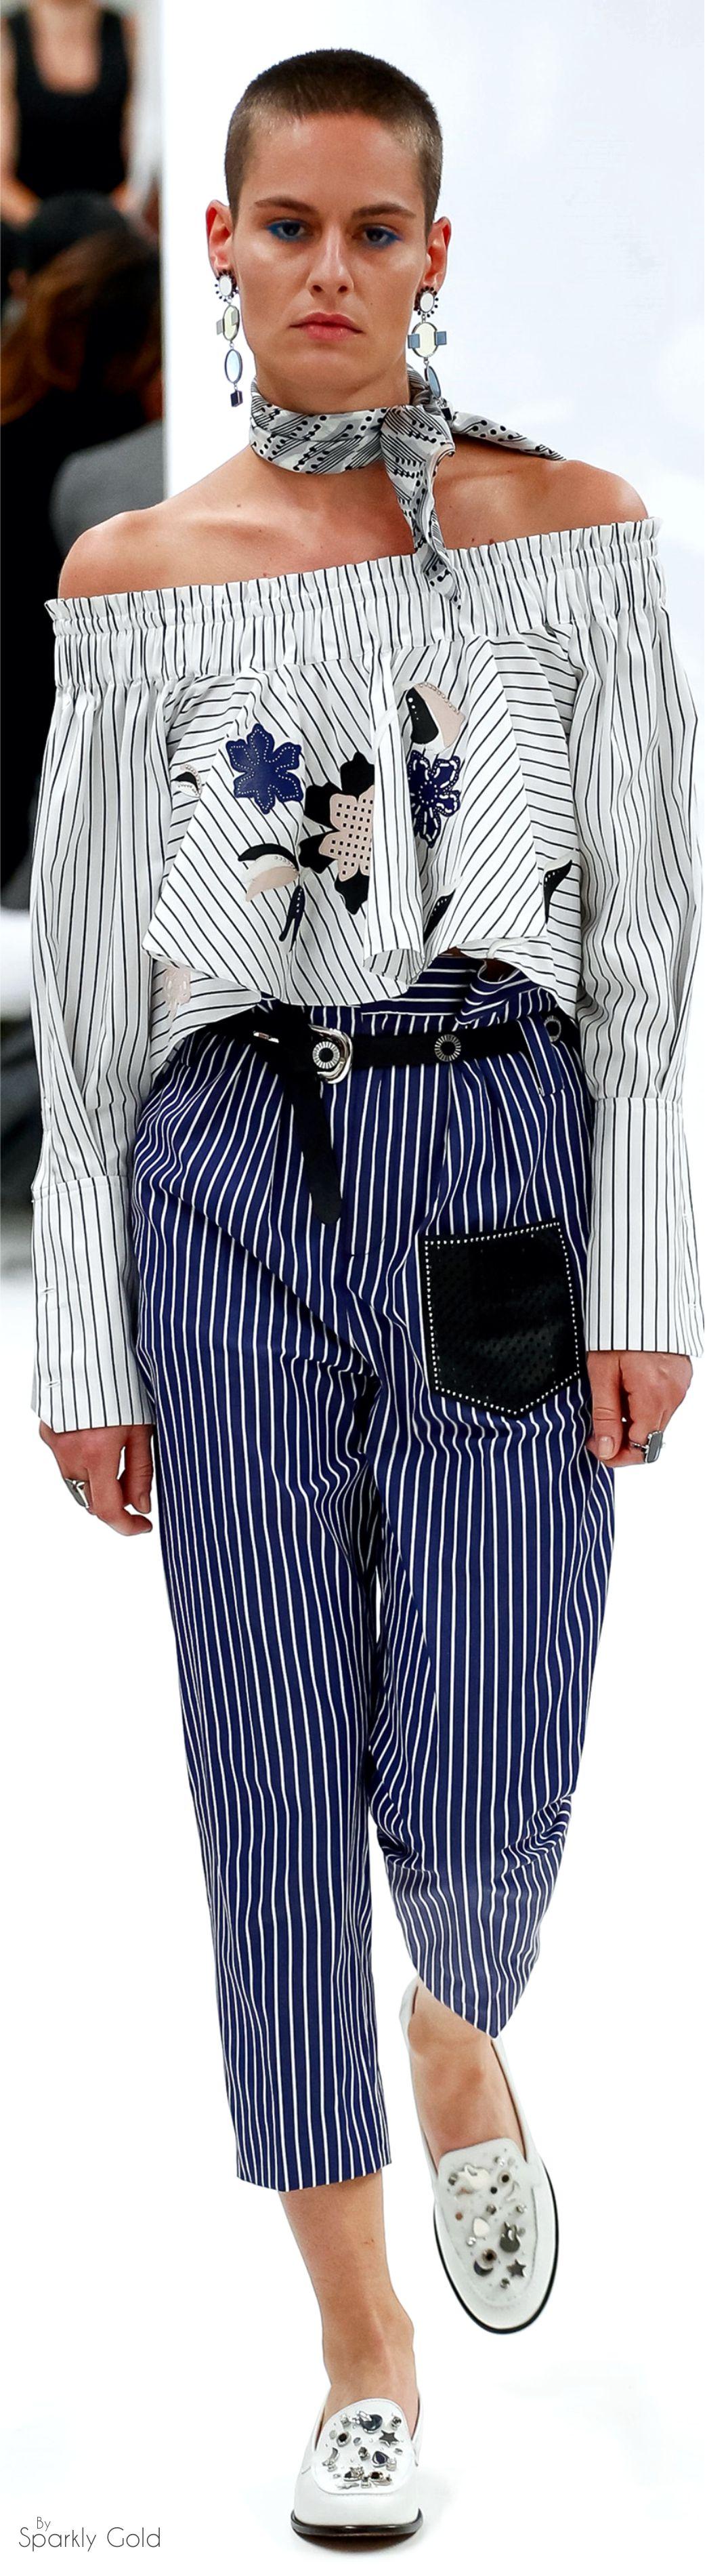 Pin by FASHION KELLIE on SPRING SUMMER FASHINSPO | Fashion ...